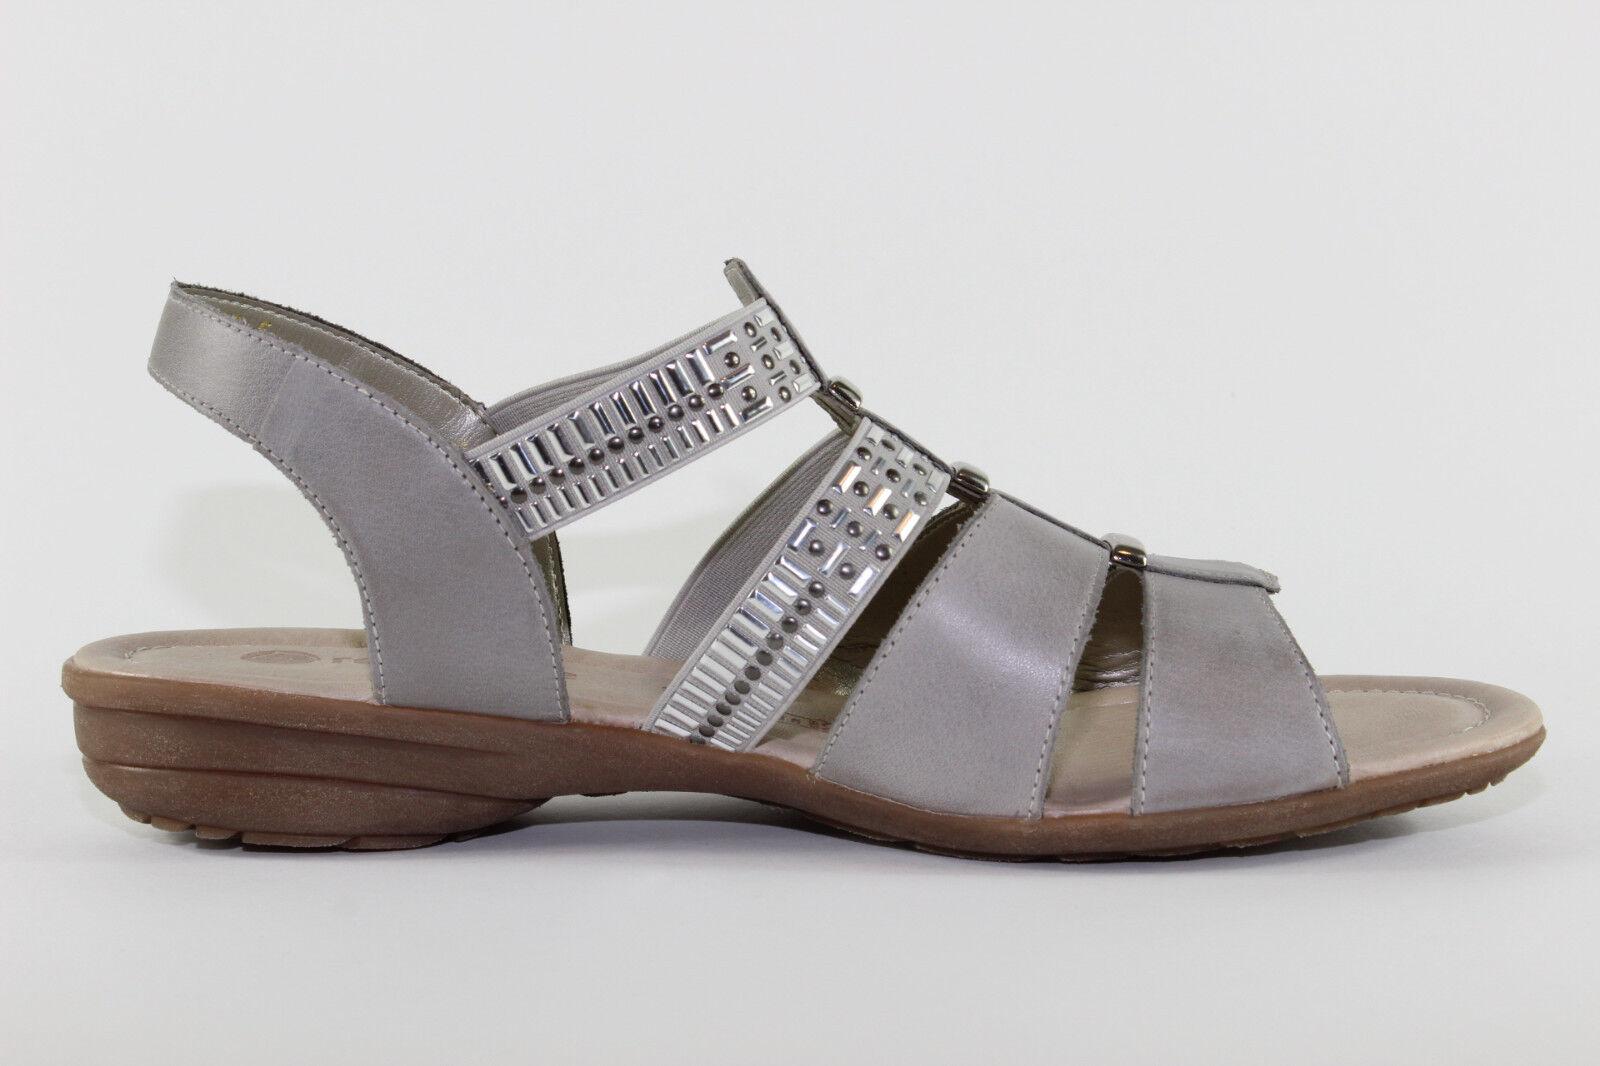 Remonte R3644-42, R3644-42, R3644-42, komfortable Sandale **Übergröße** c2439d